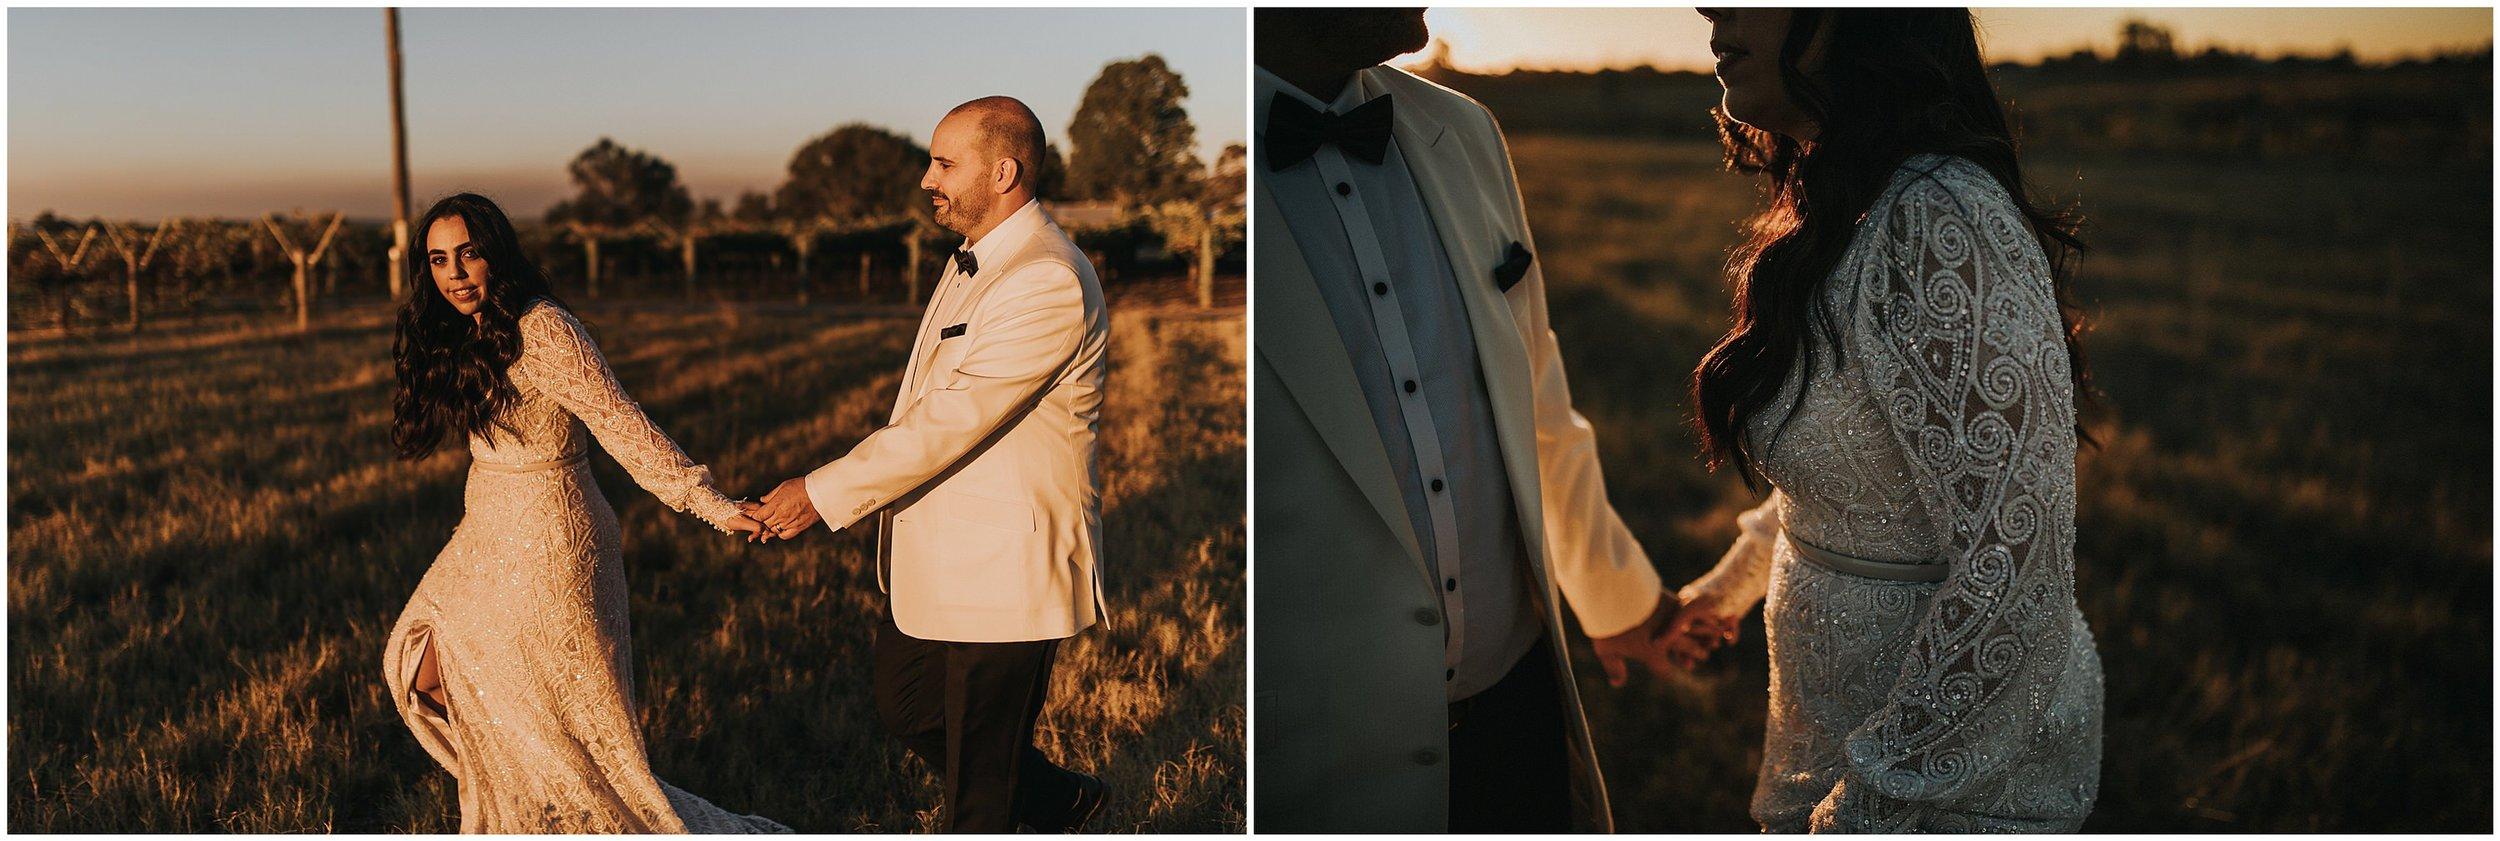 surprise_perth_wedding_keeper_creative_19.JPG